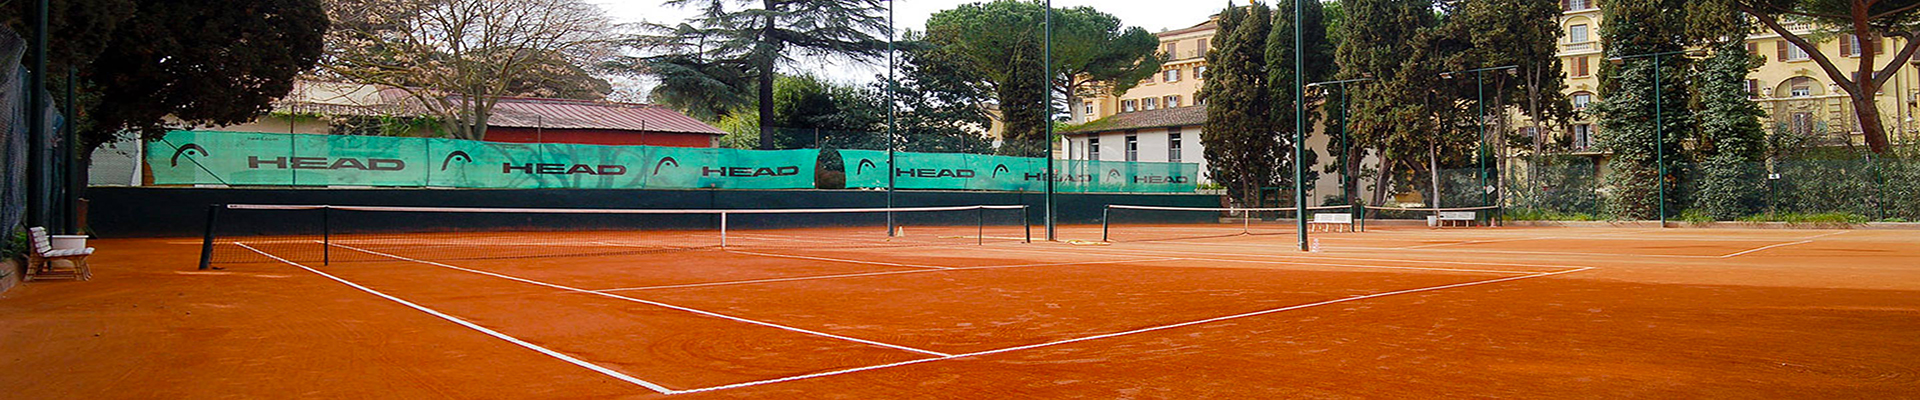 Campi Da Tennis Roma.Home Circolo Tennis Belle Arti Roma